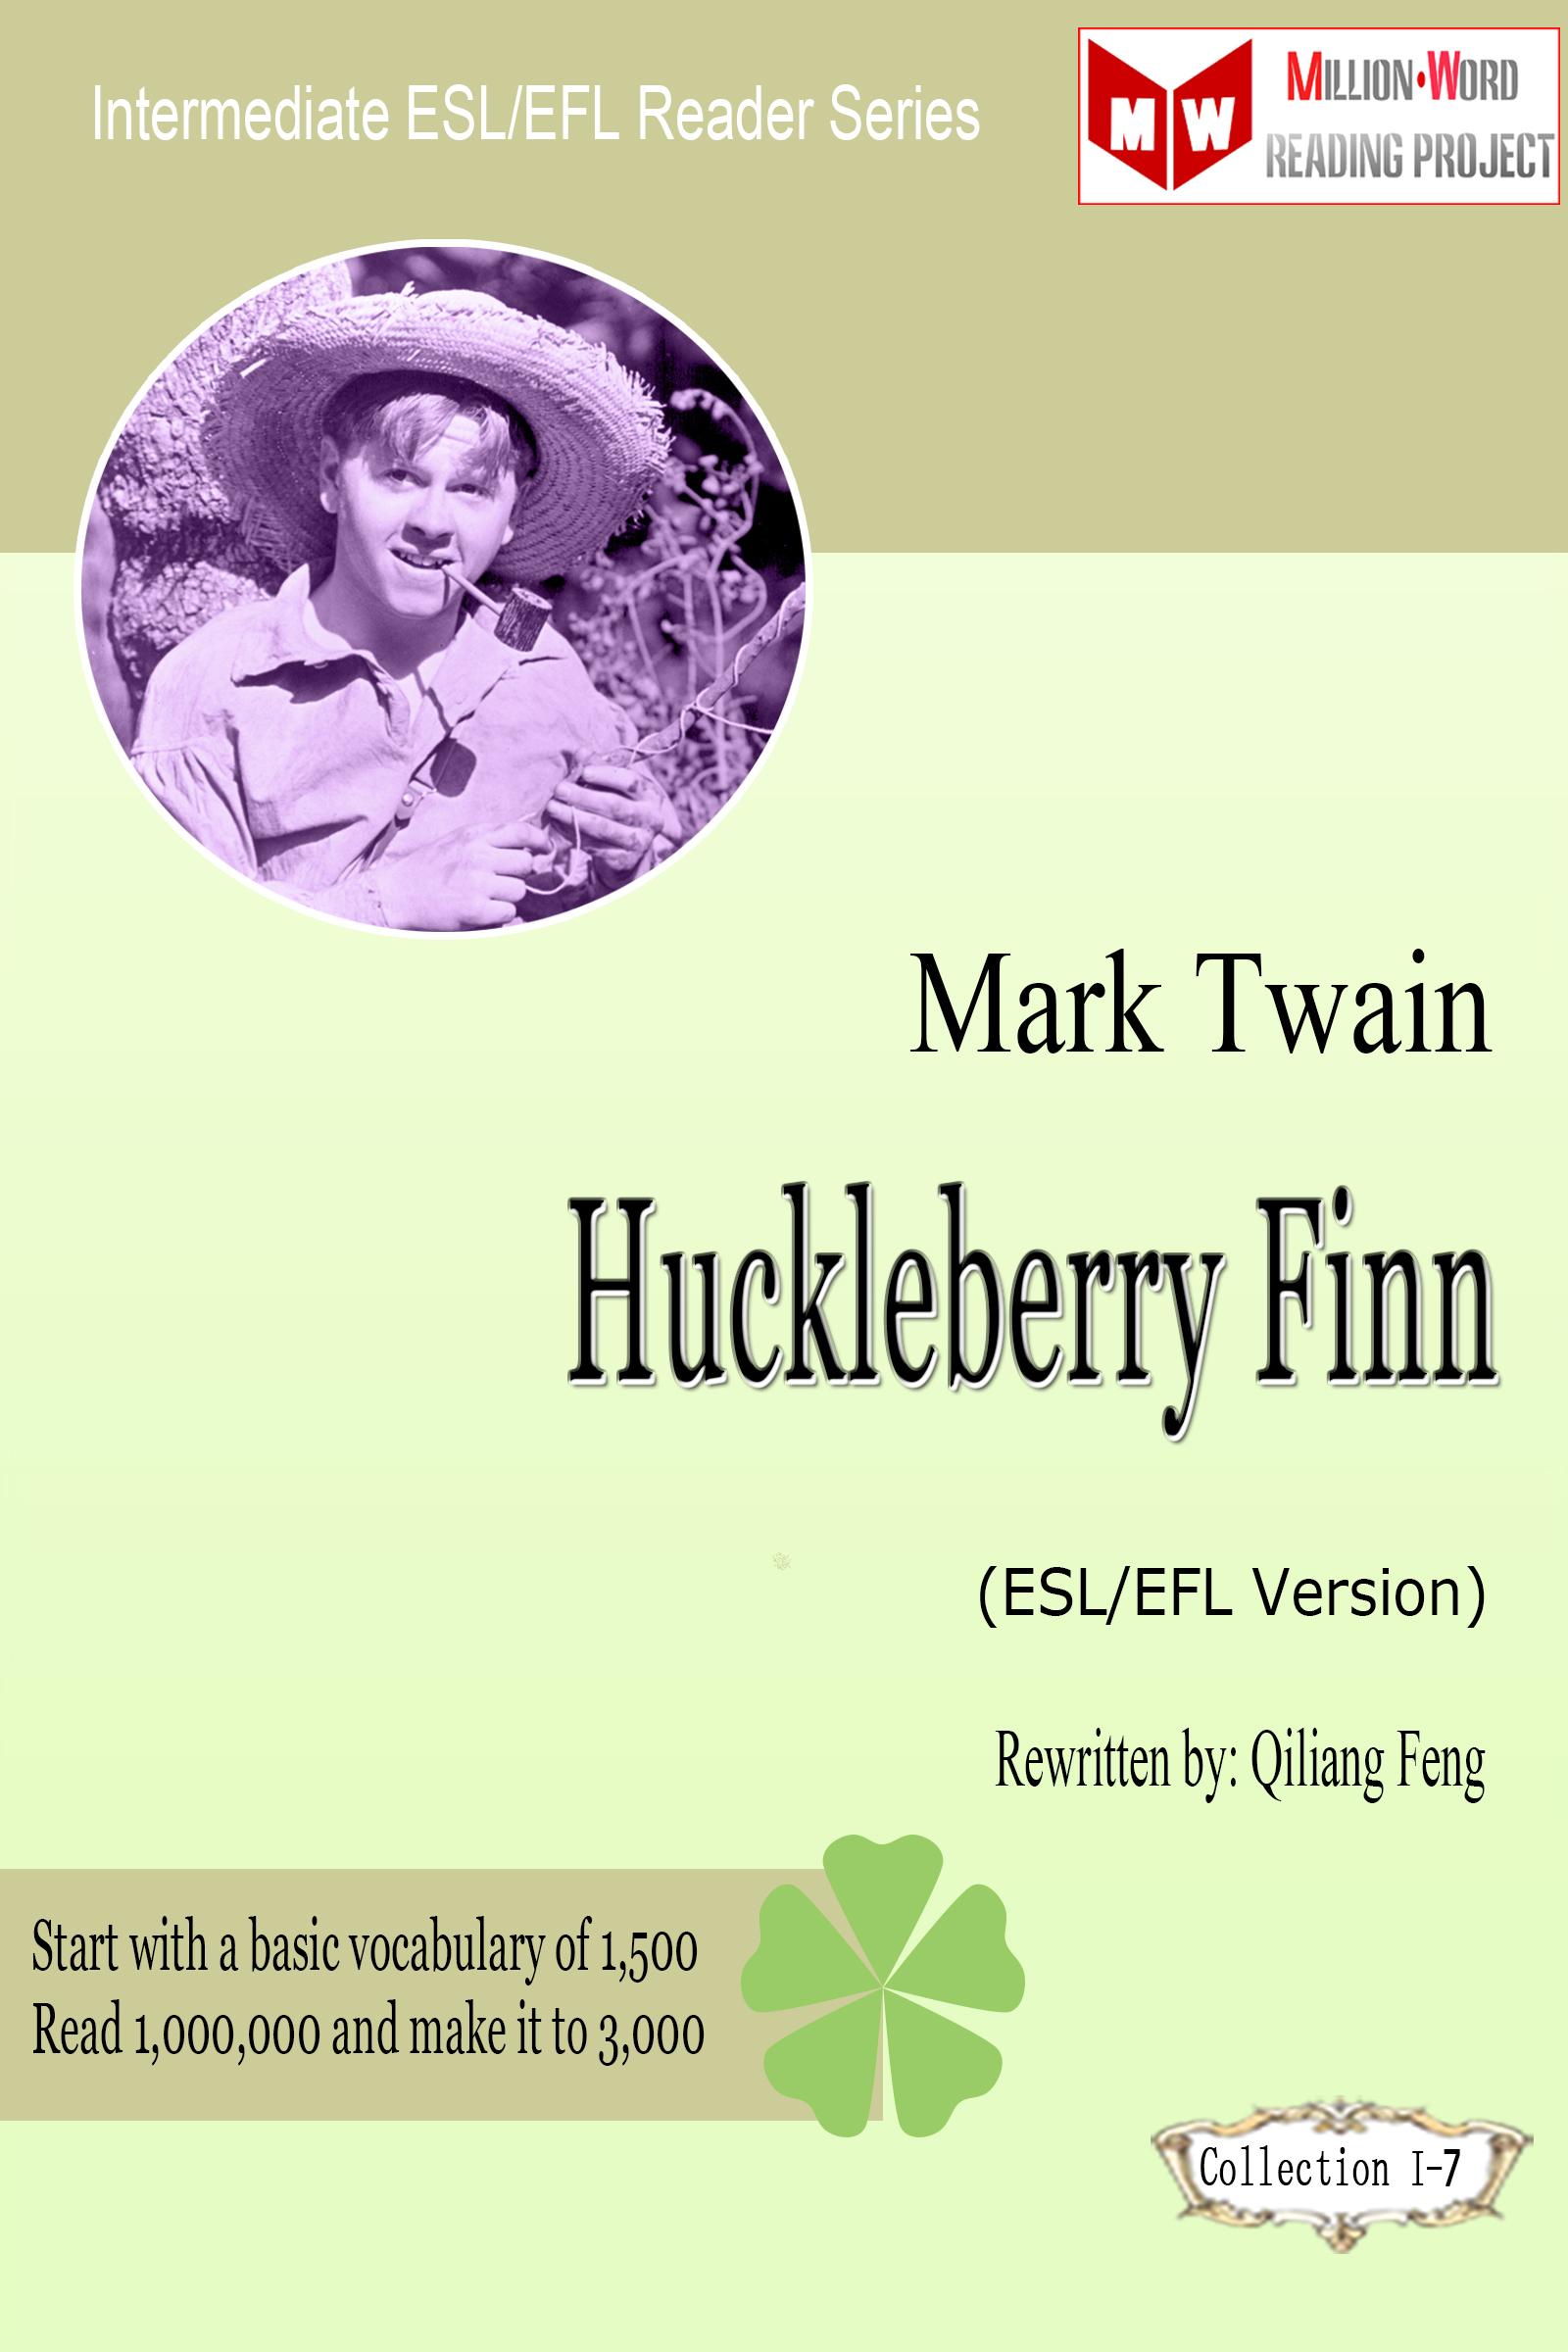 Mark Twain Huckleberry Finn By Qiliang Feng